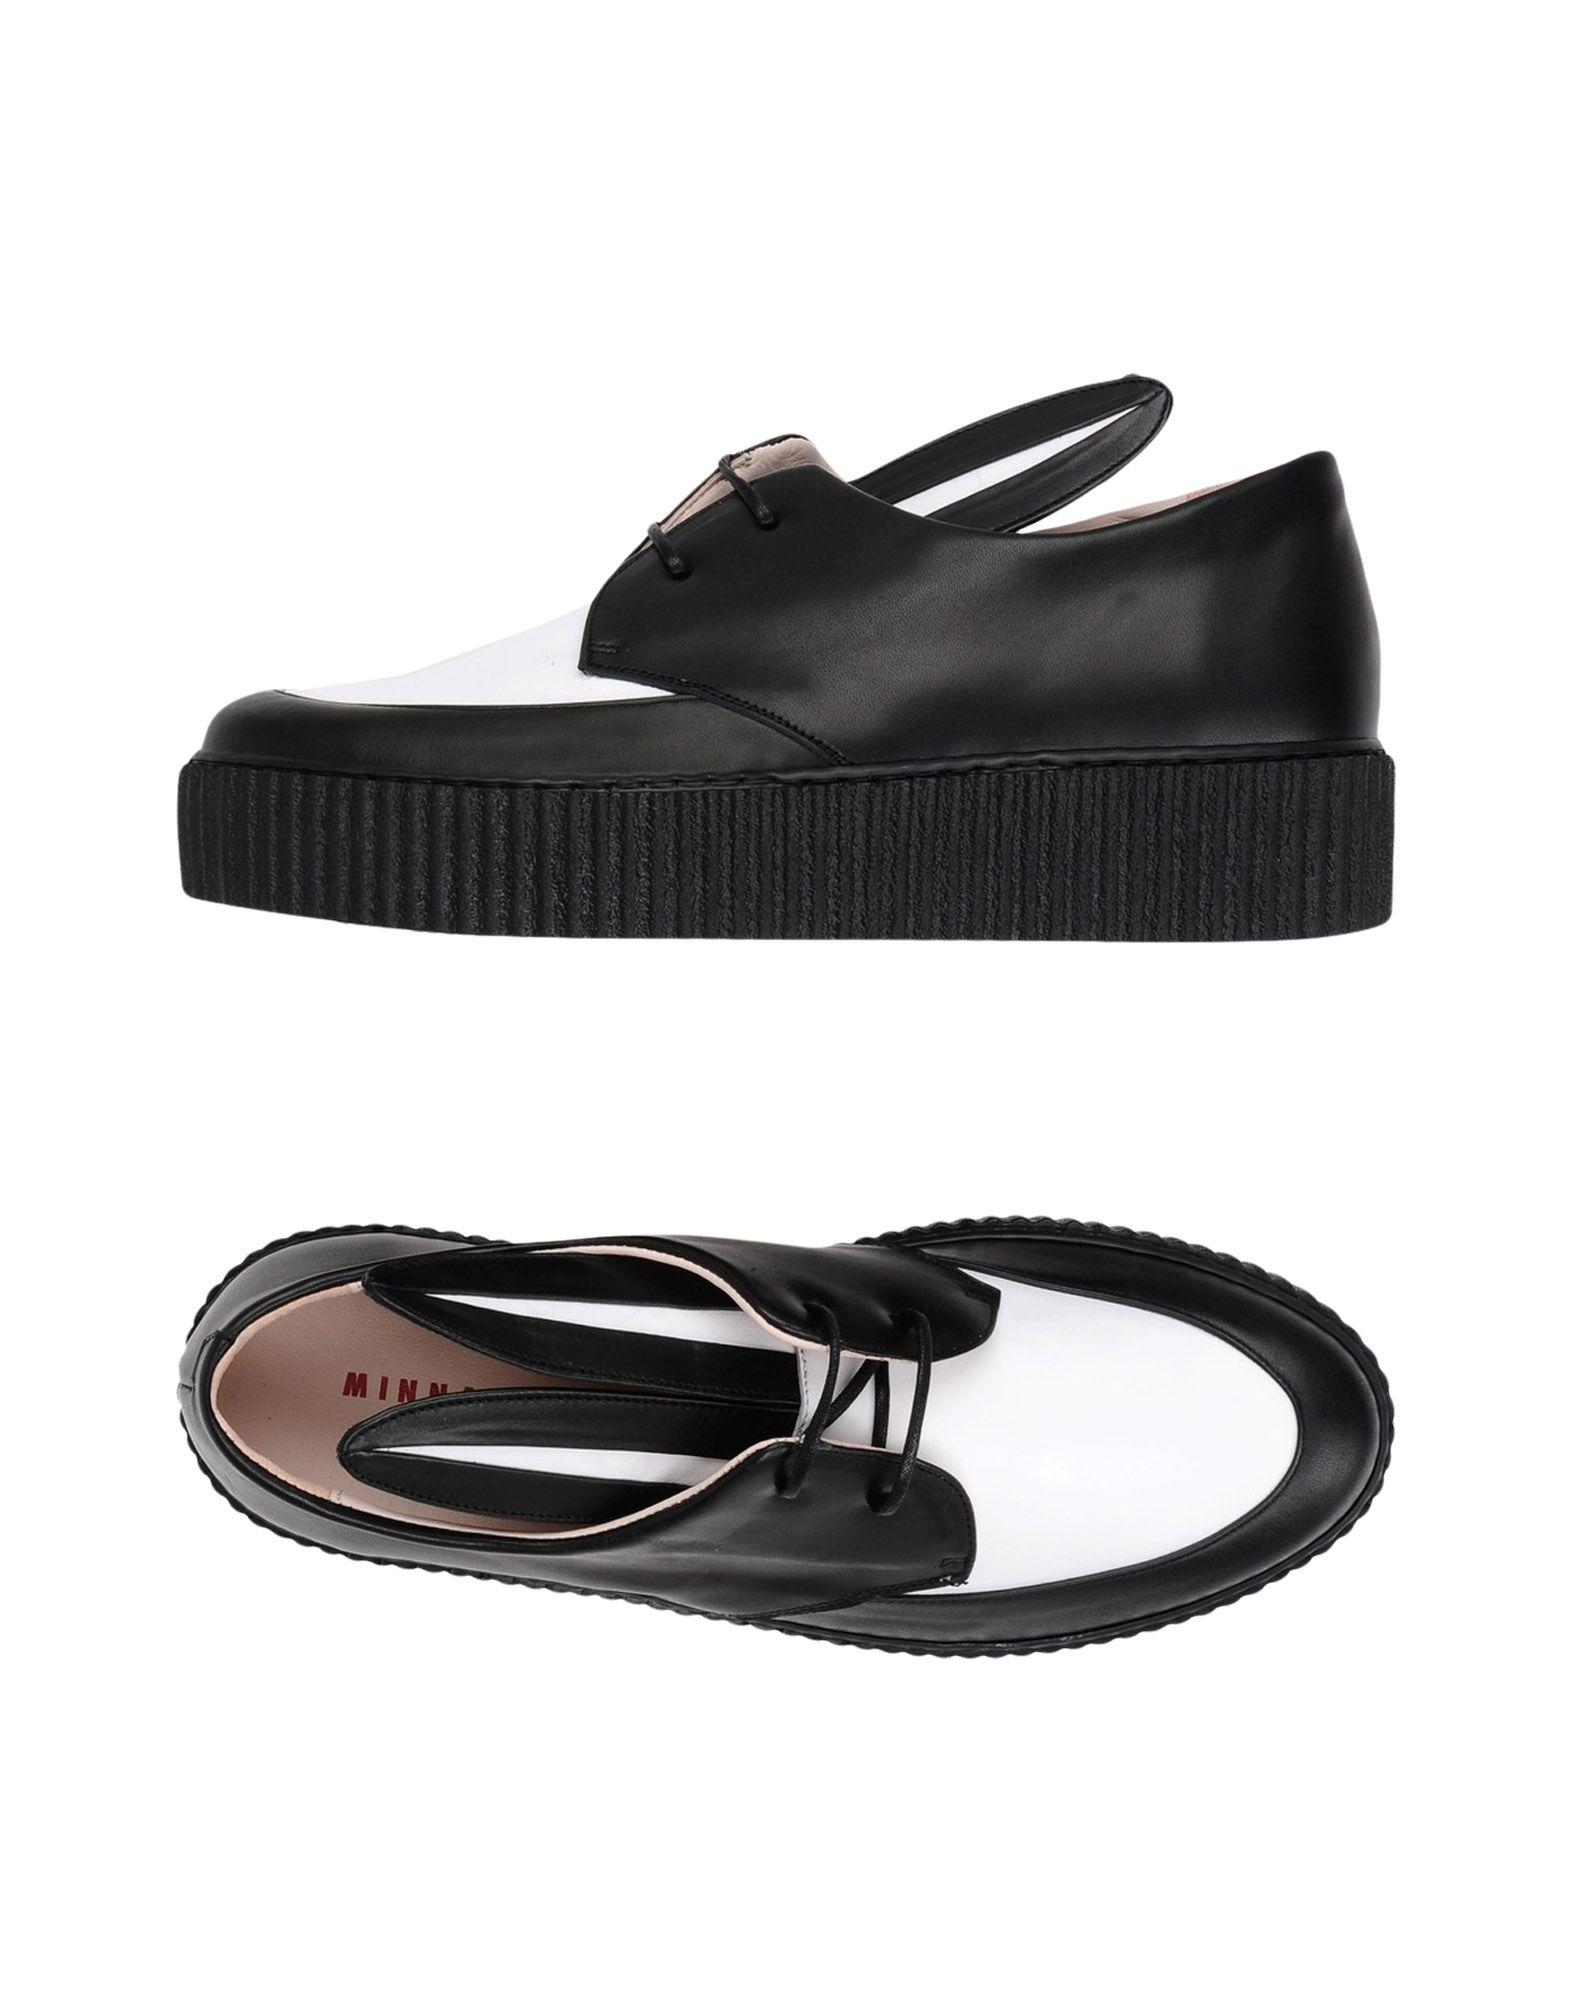 Sneakers Minna Parikka Creeper Bunny - Femme - Sneakers Minna Parikka sur